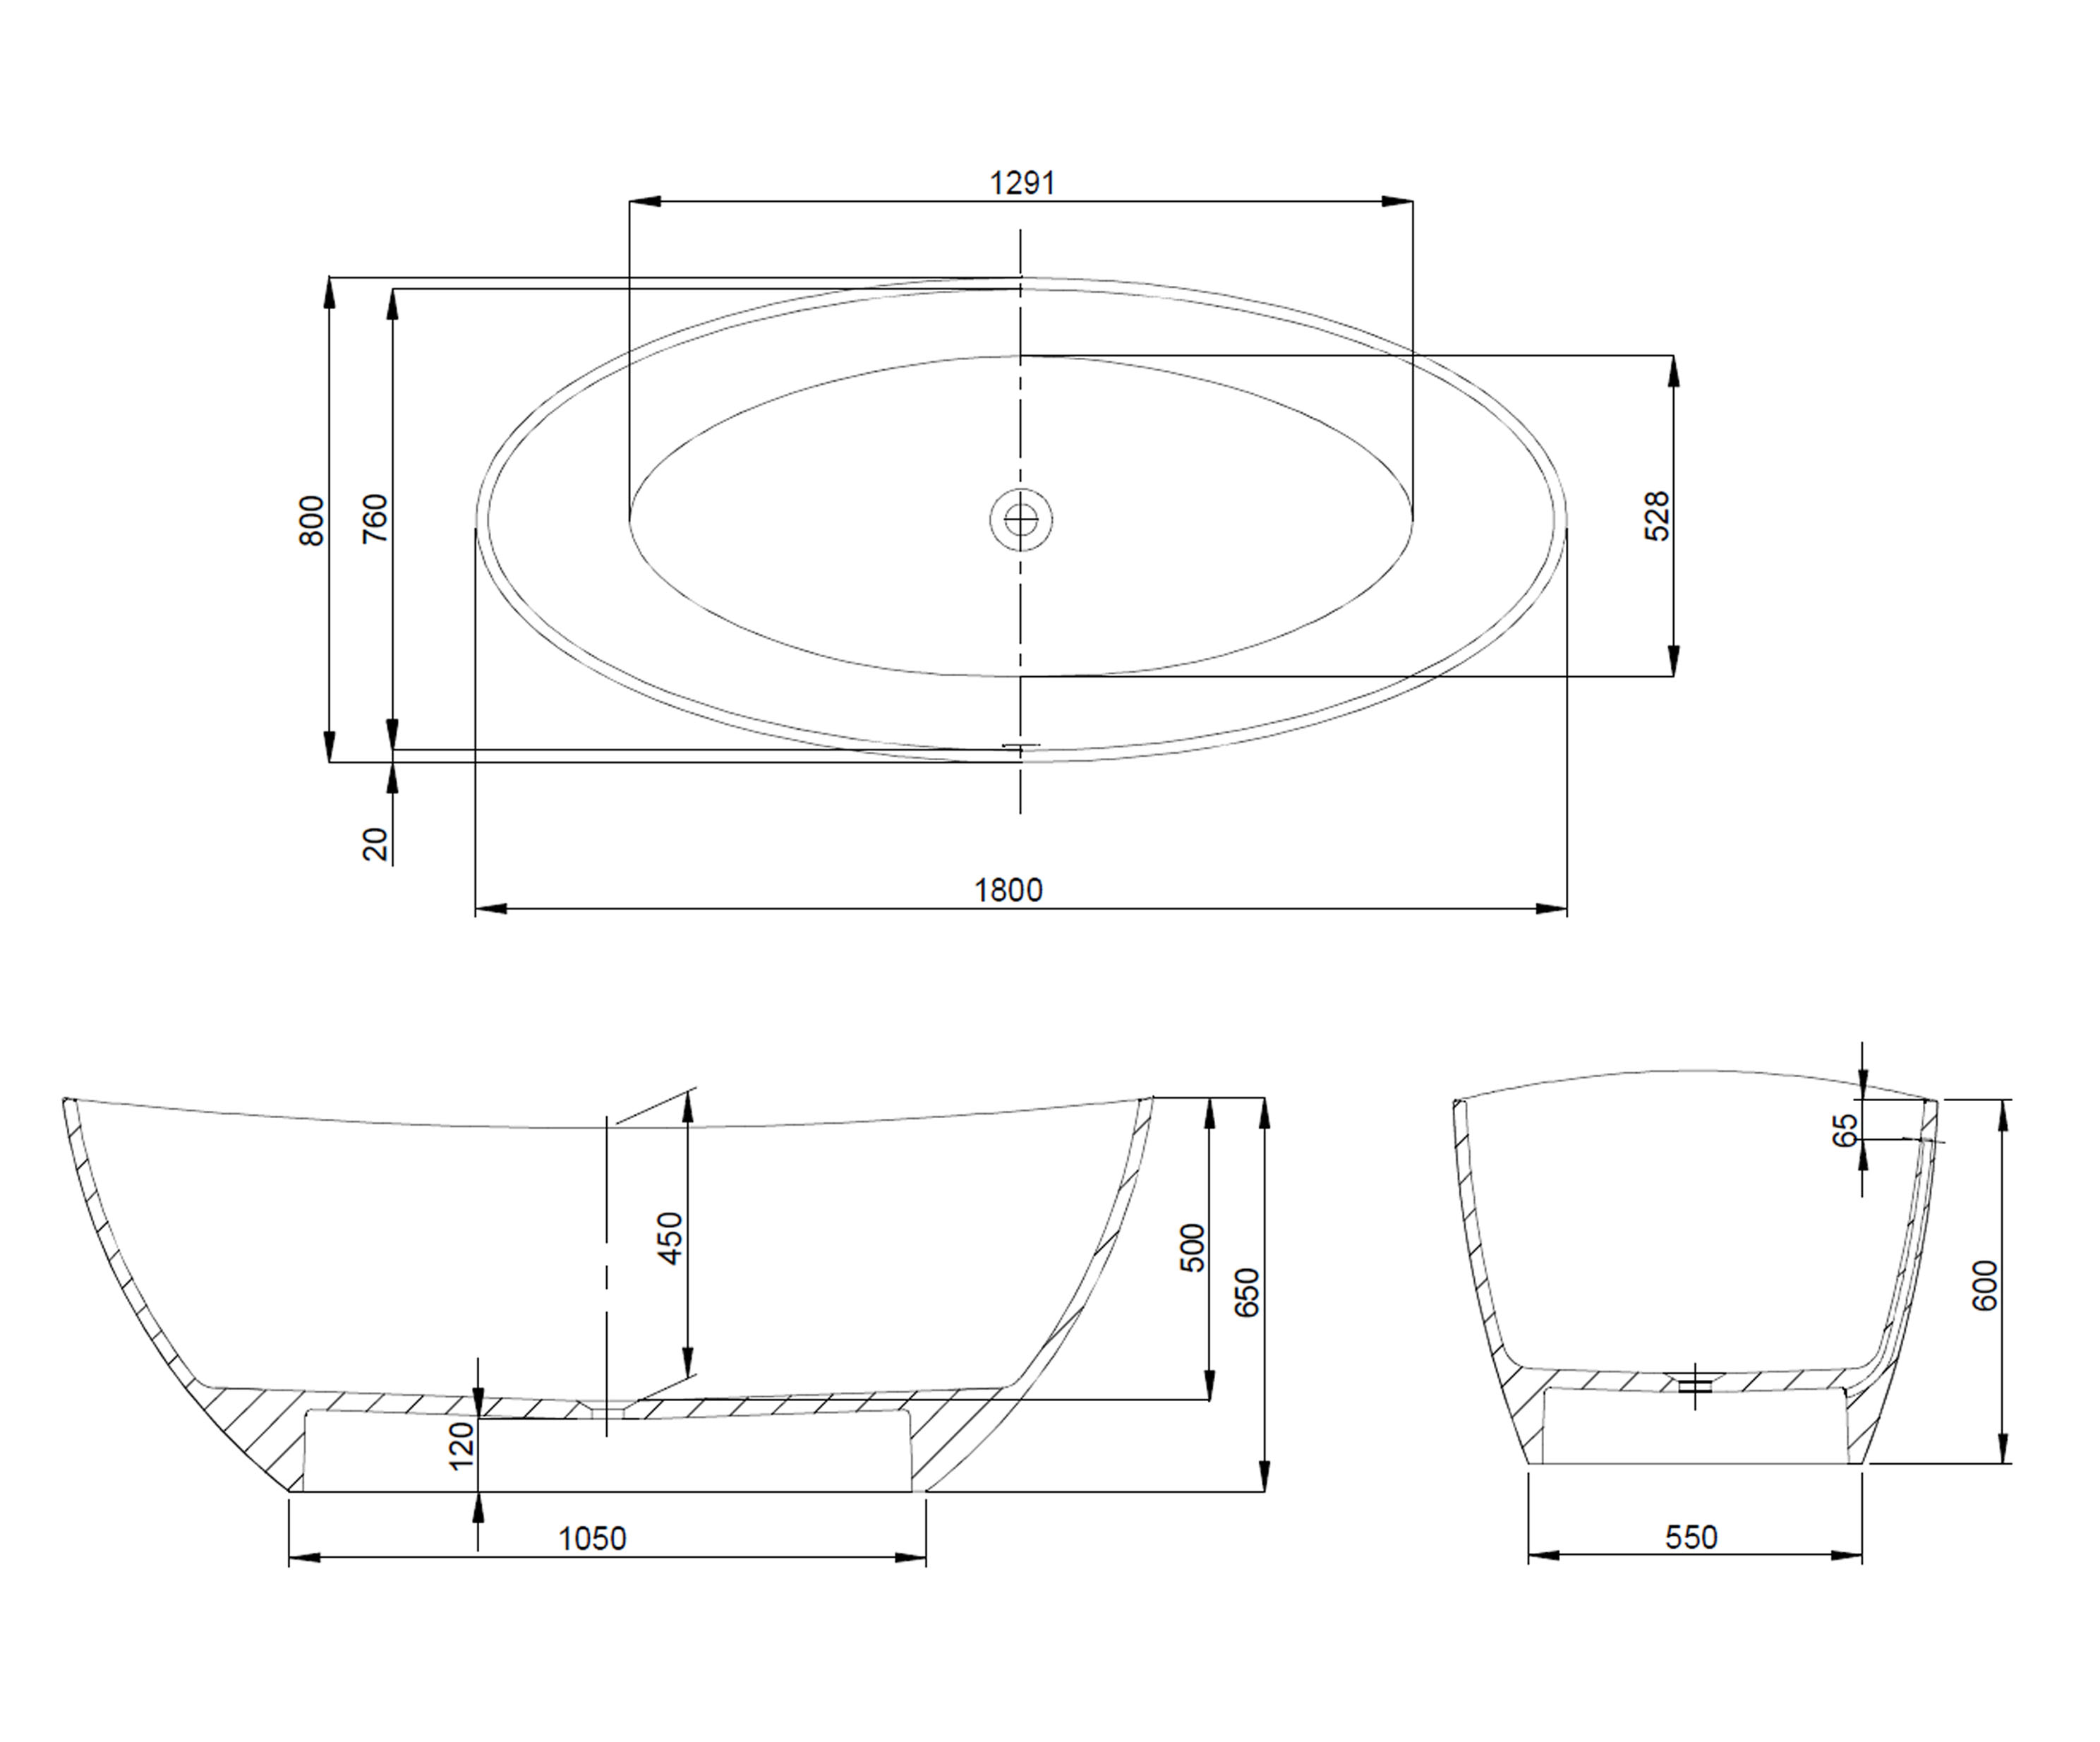 Hoesch Namur Badewanne : Hoesch freistehende badewanne namur solique oval